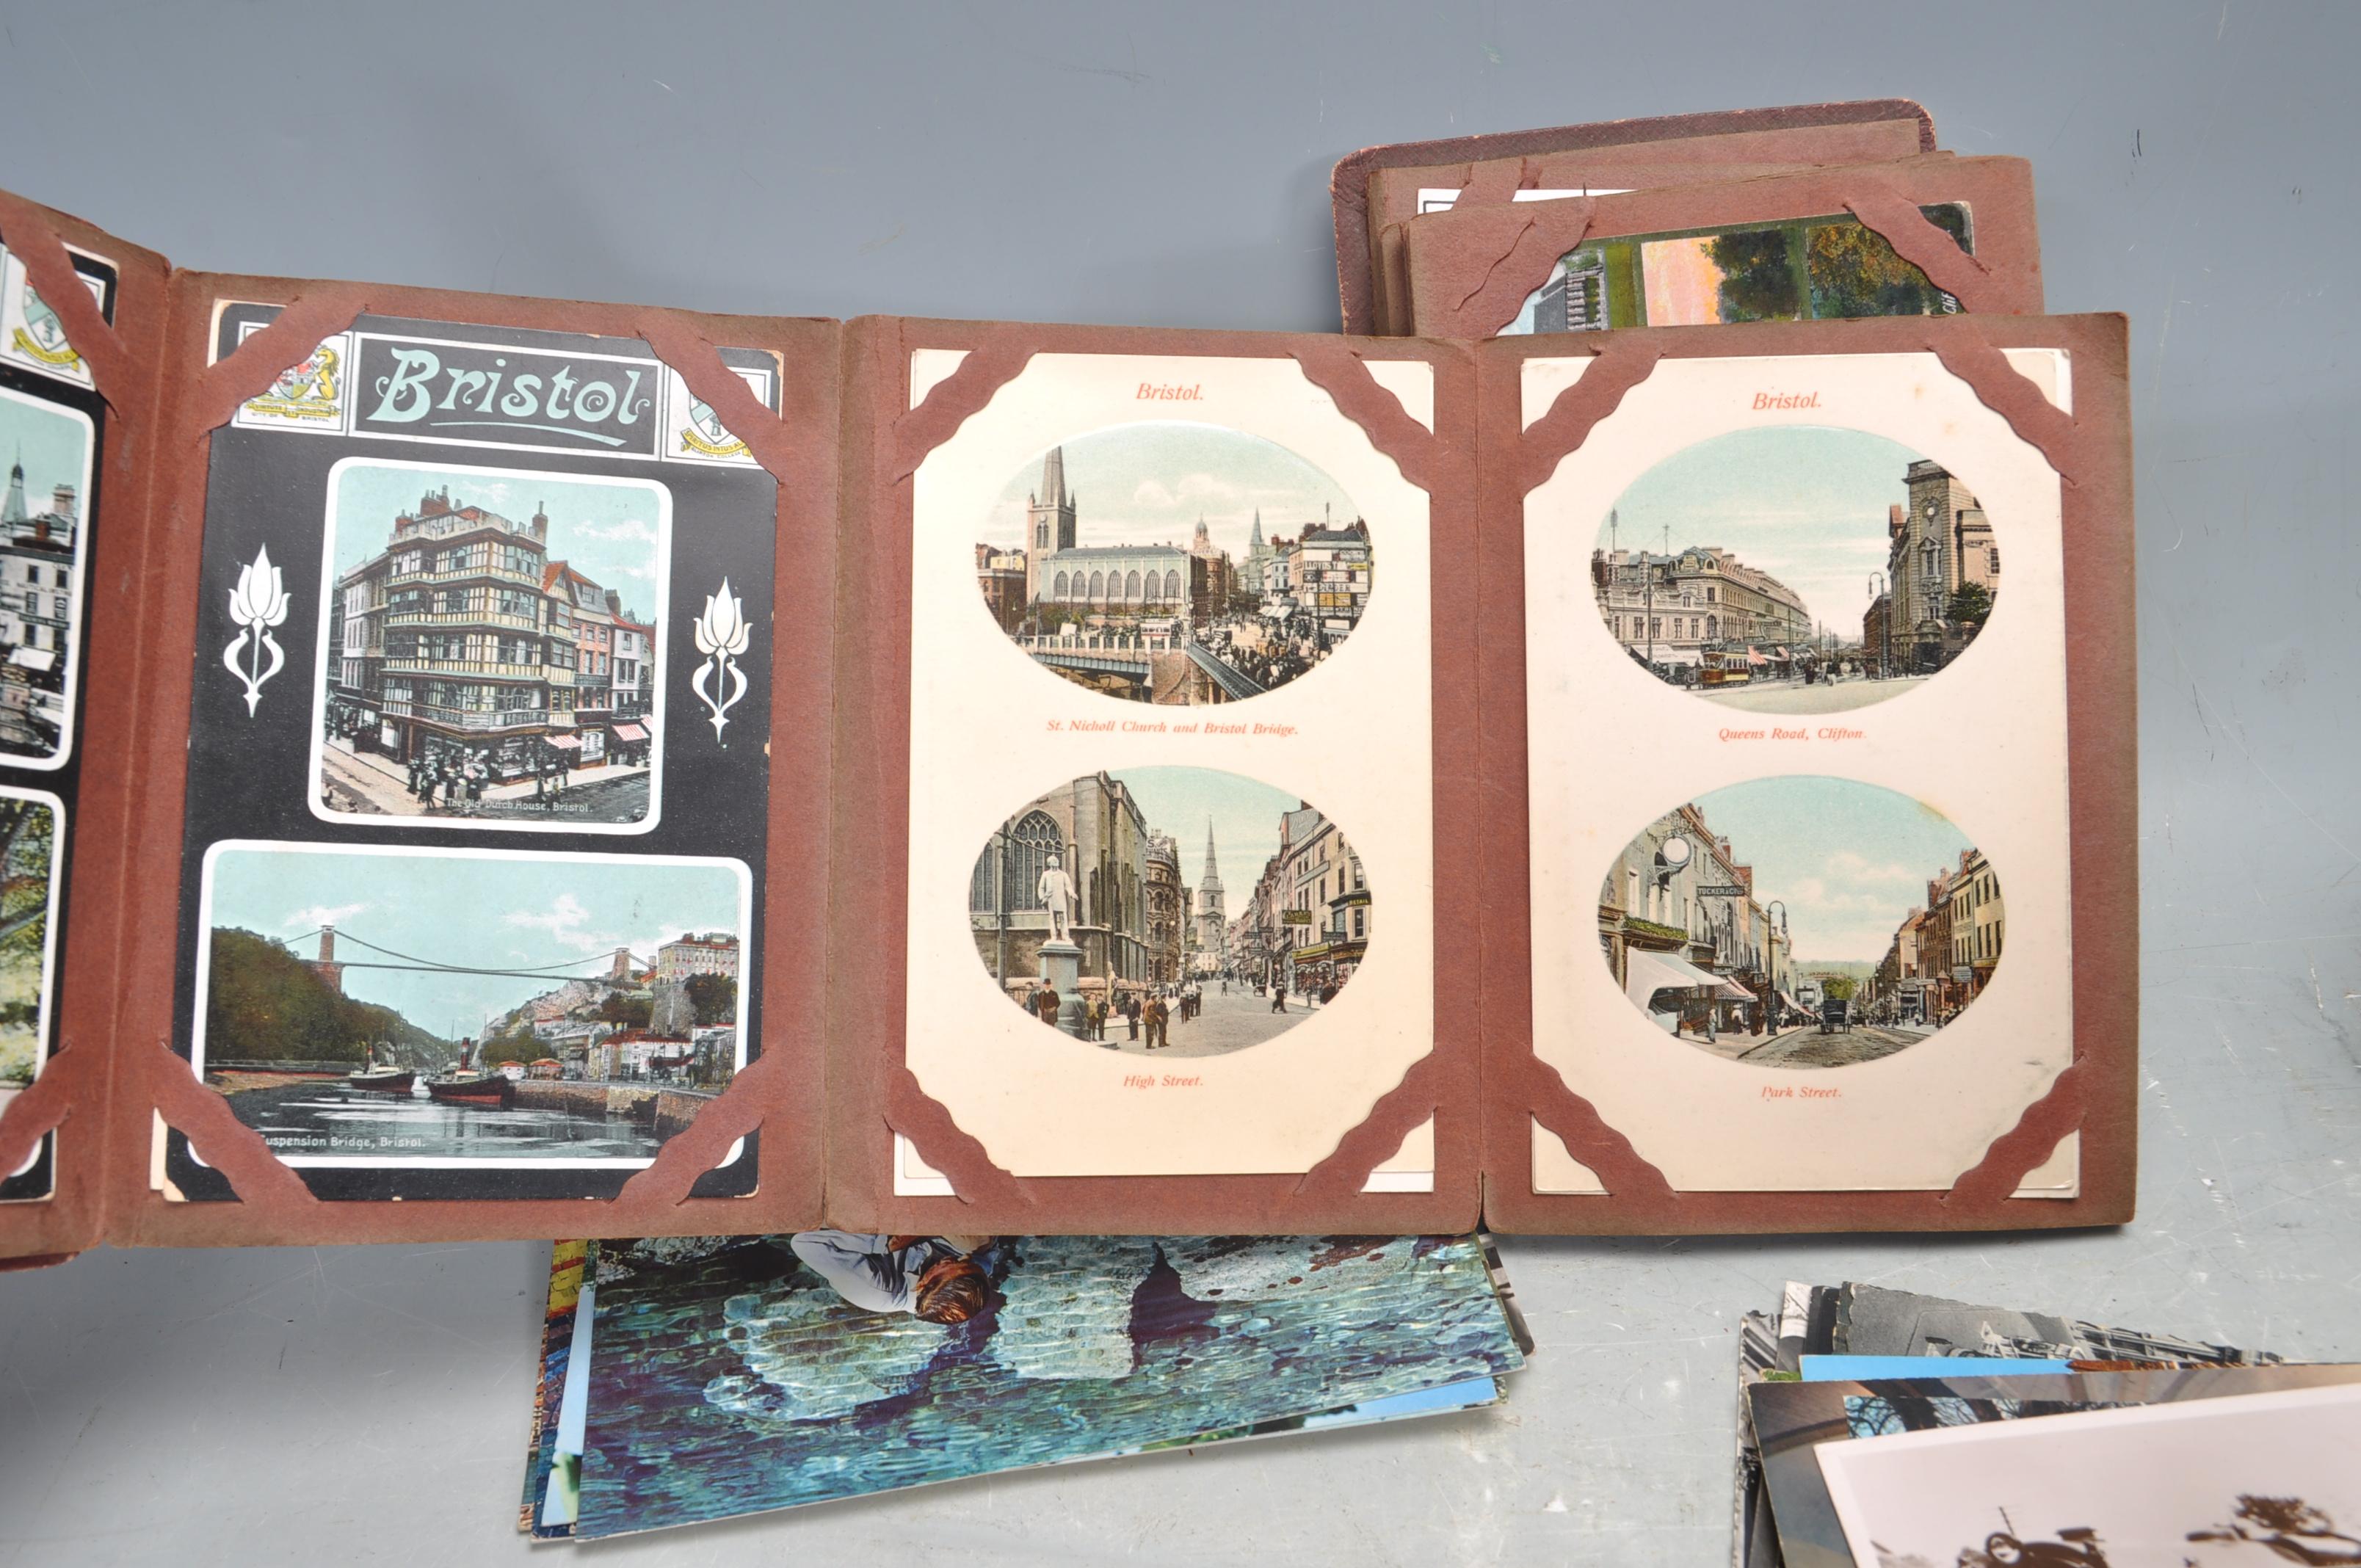 A SHOE BOX OF VINTAGE POSTCARDS - Image 8 of 8